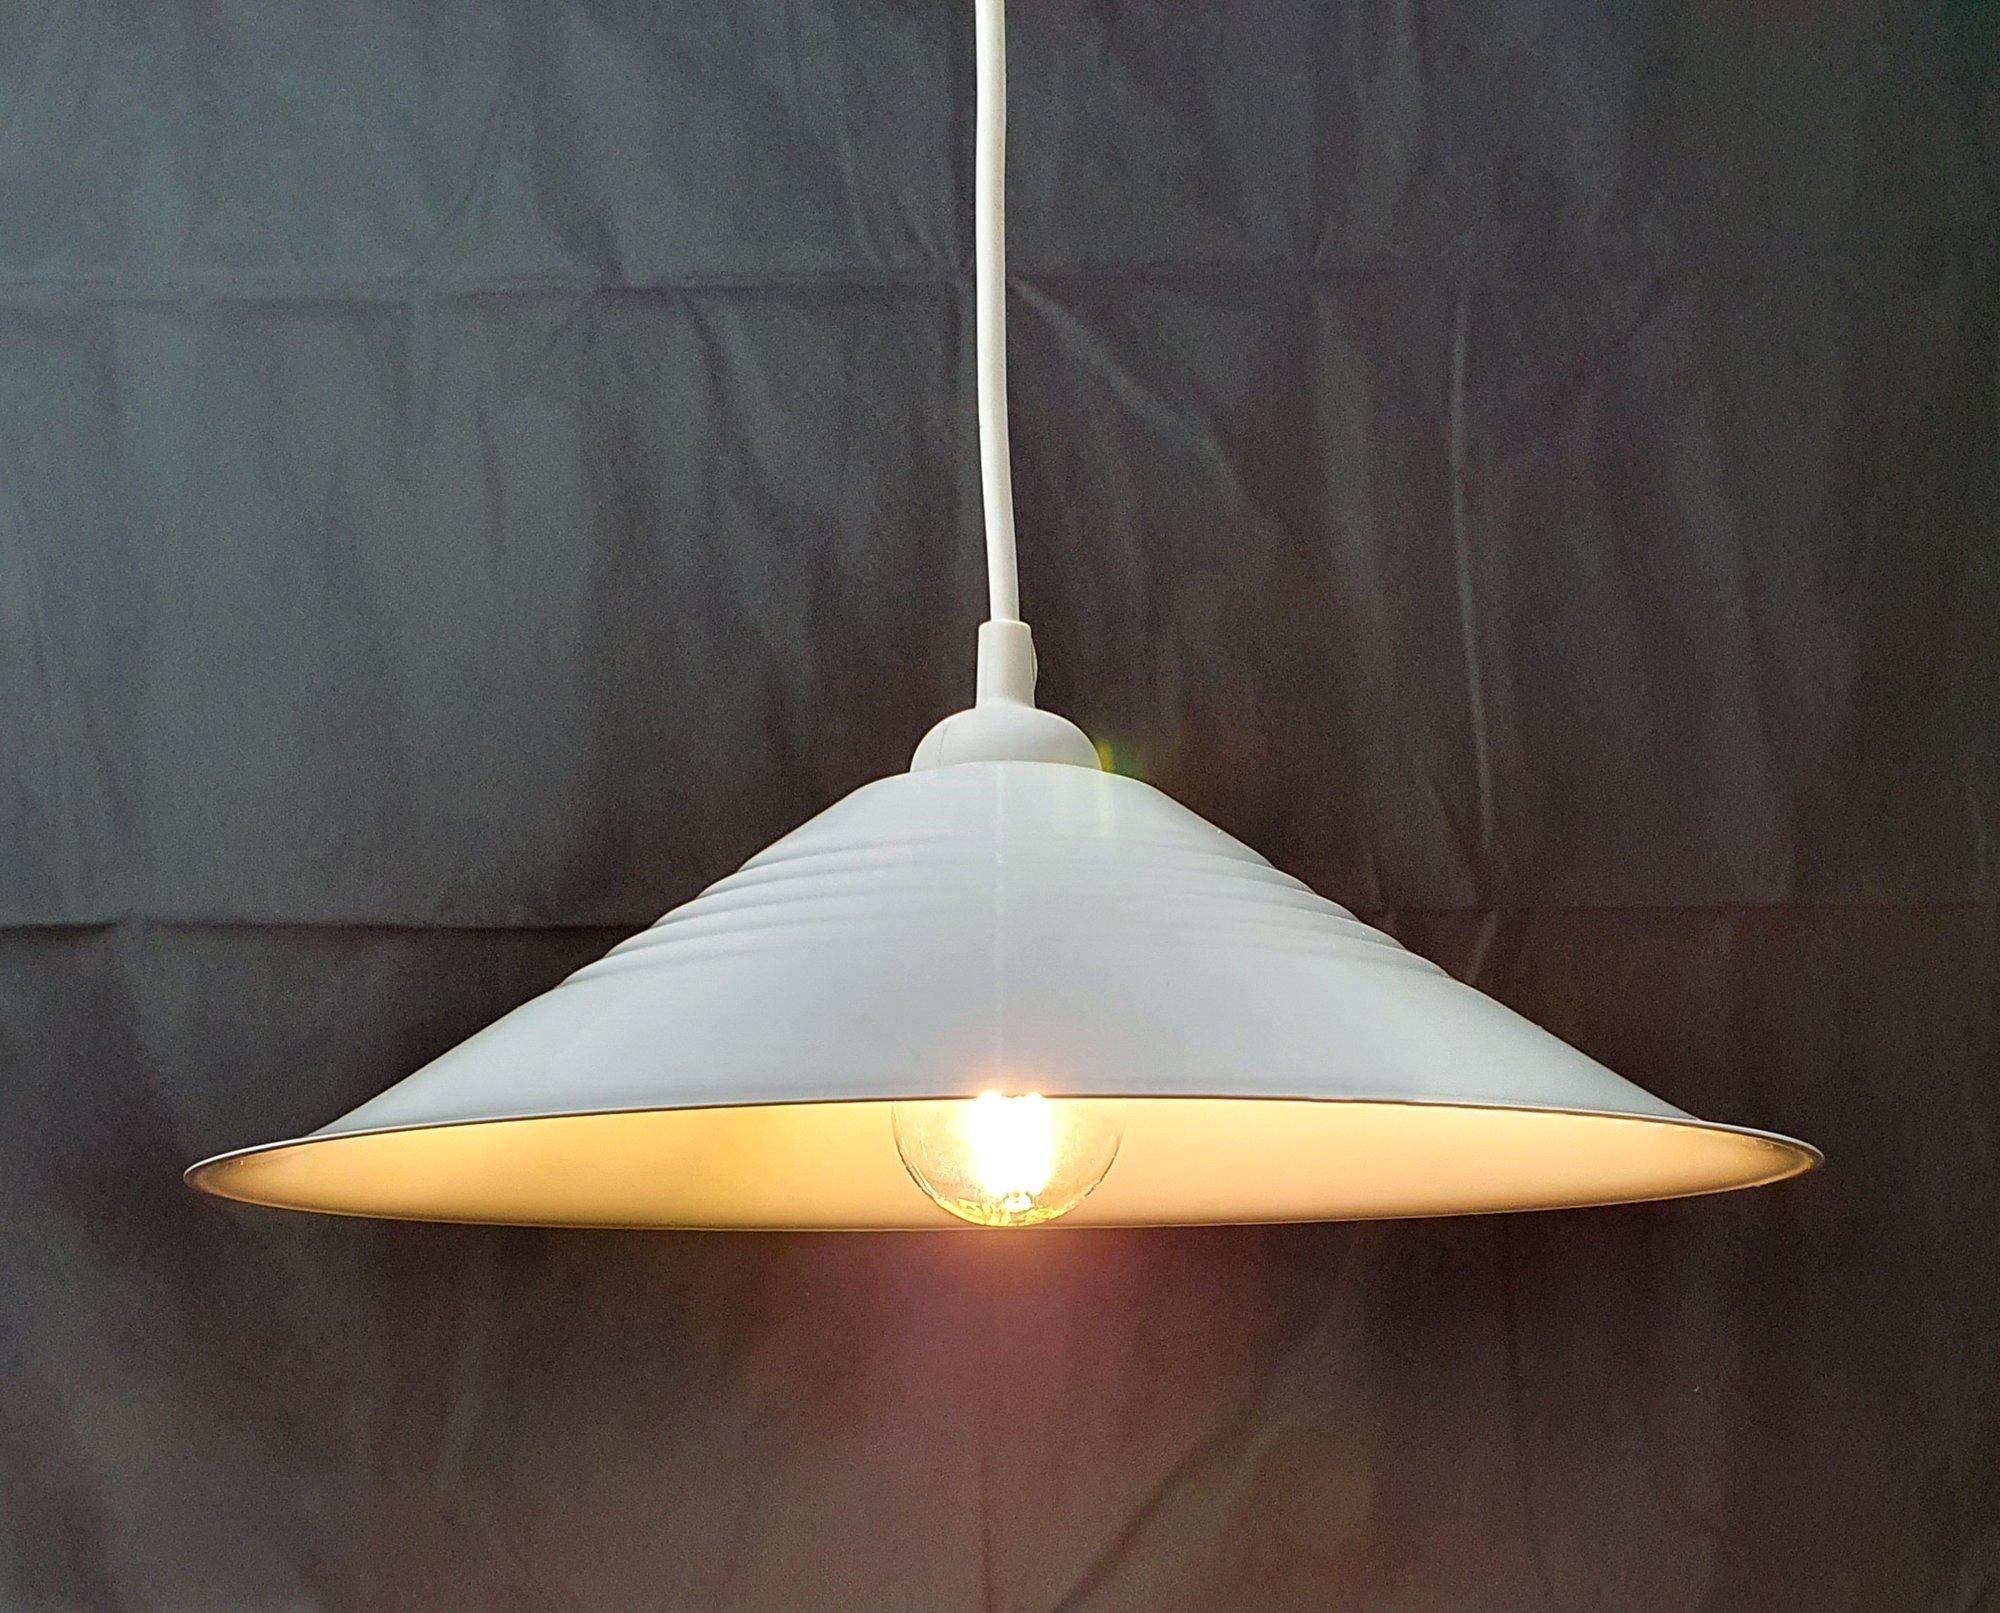 IKEA retro takpendel skomakarlampa i plåt, To.. (416717918